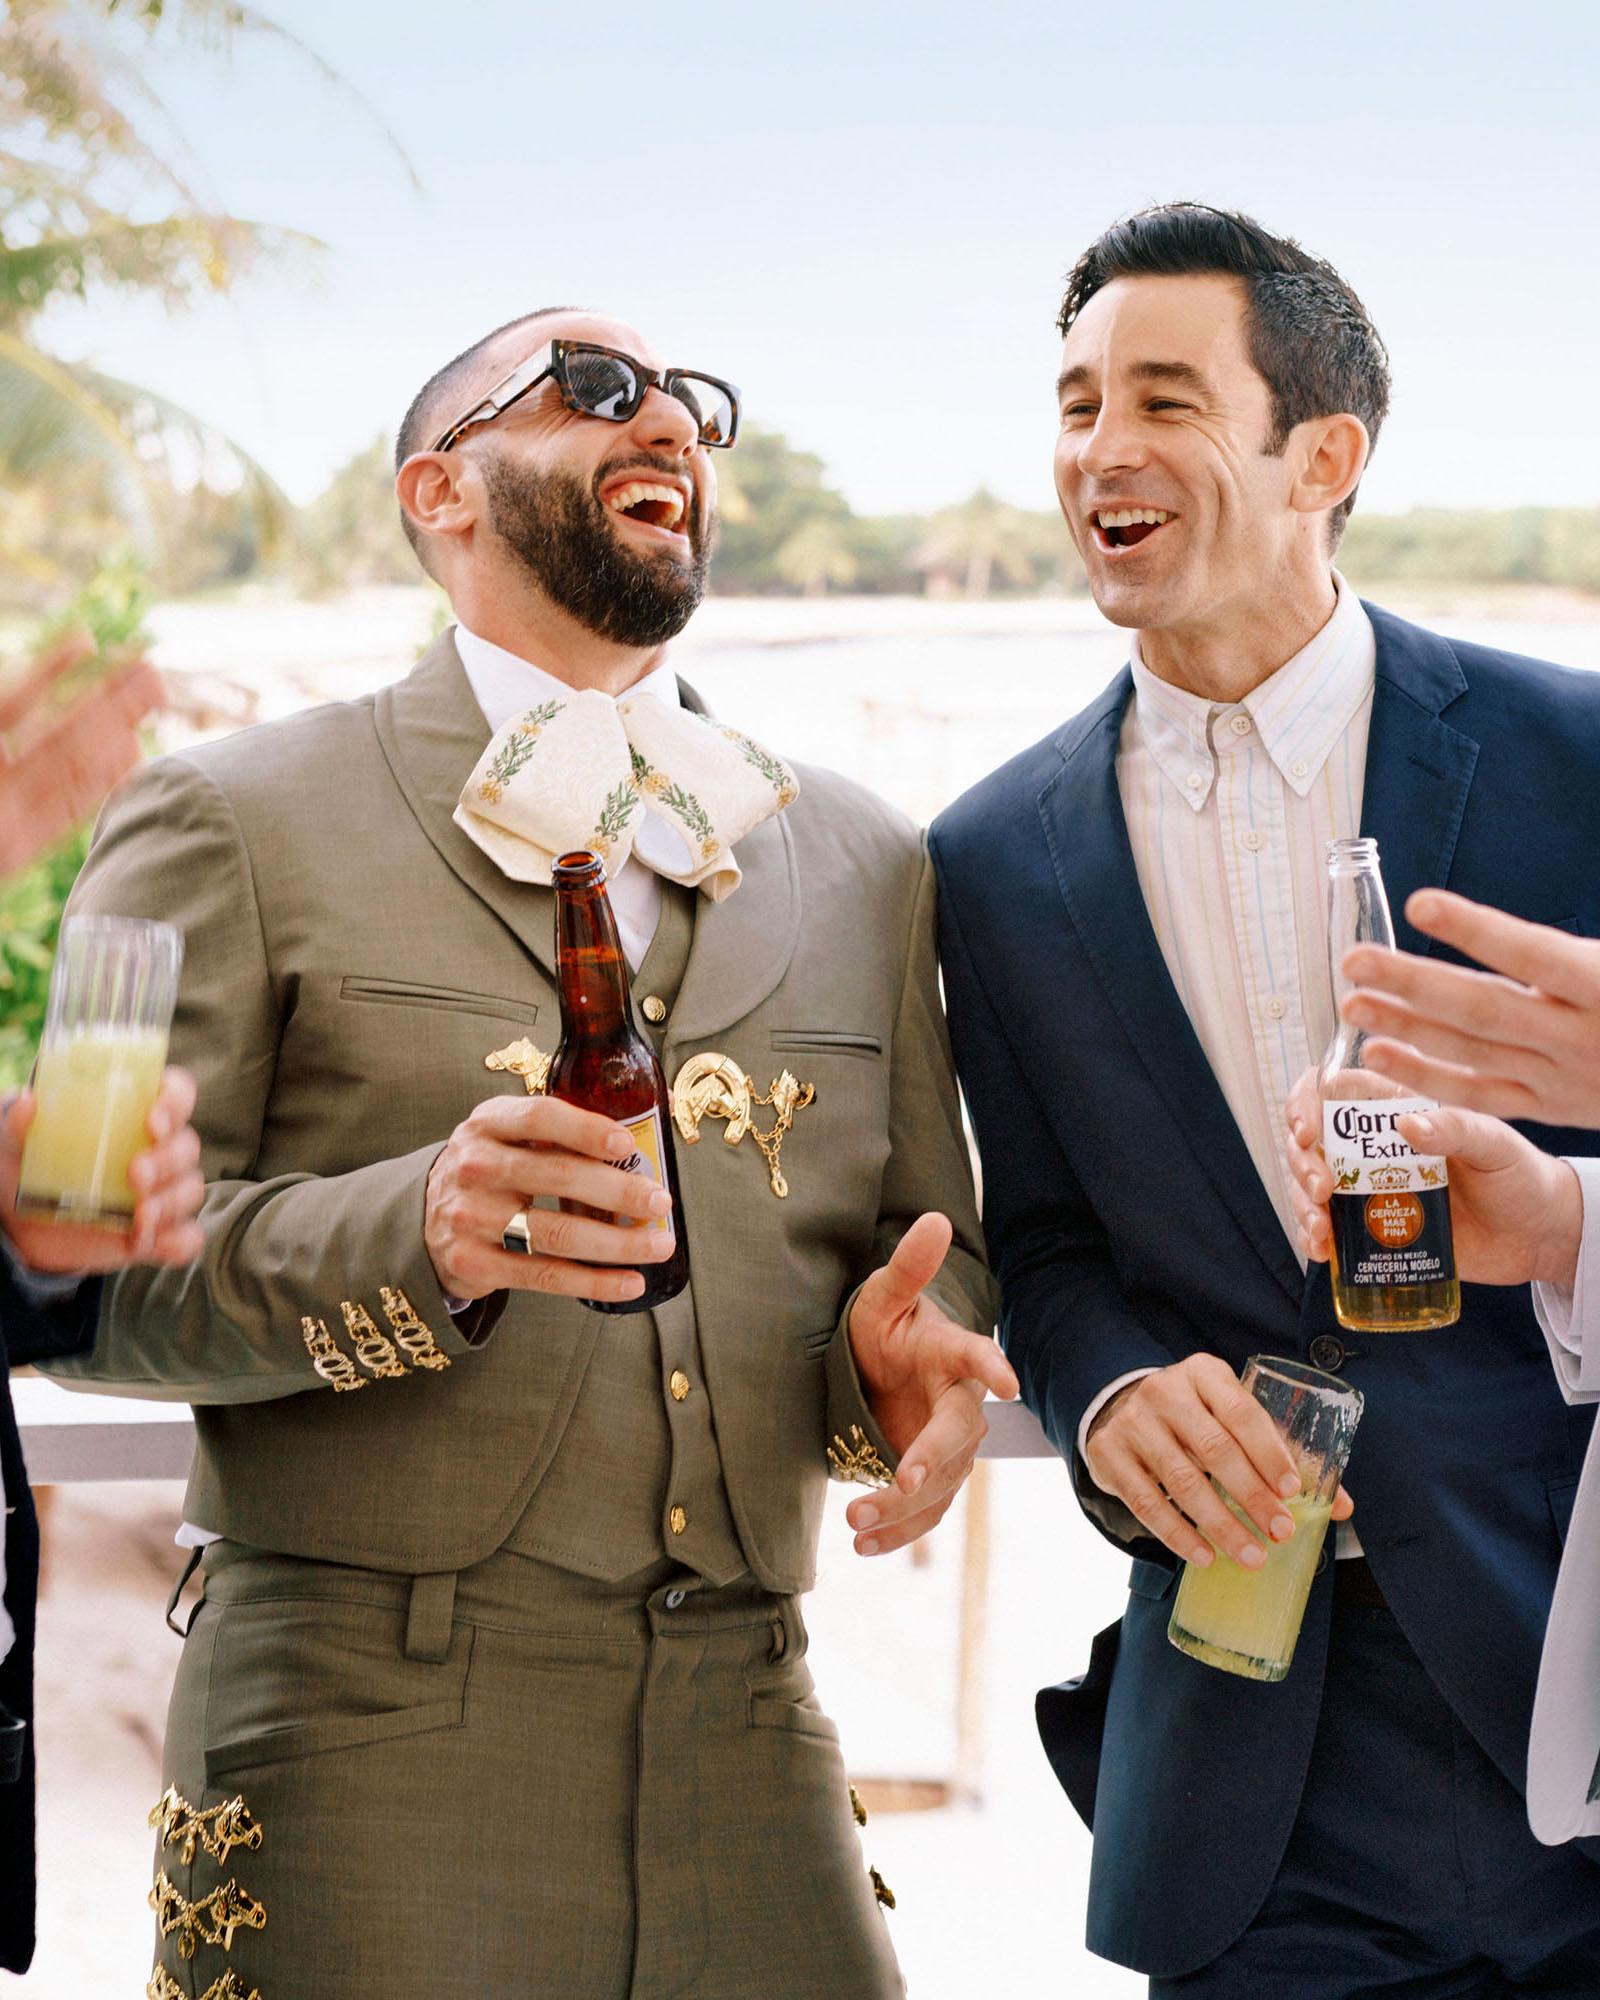 ariel trevor wedding tulum mexico mariachi suit beers